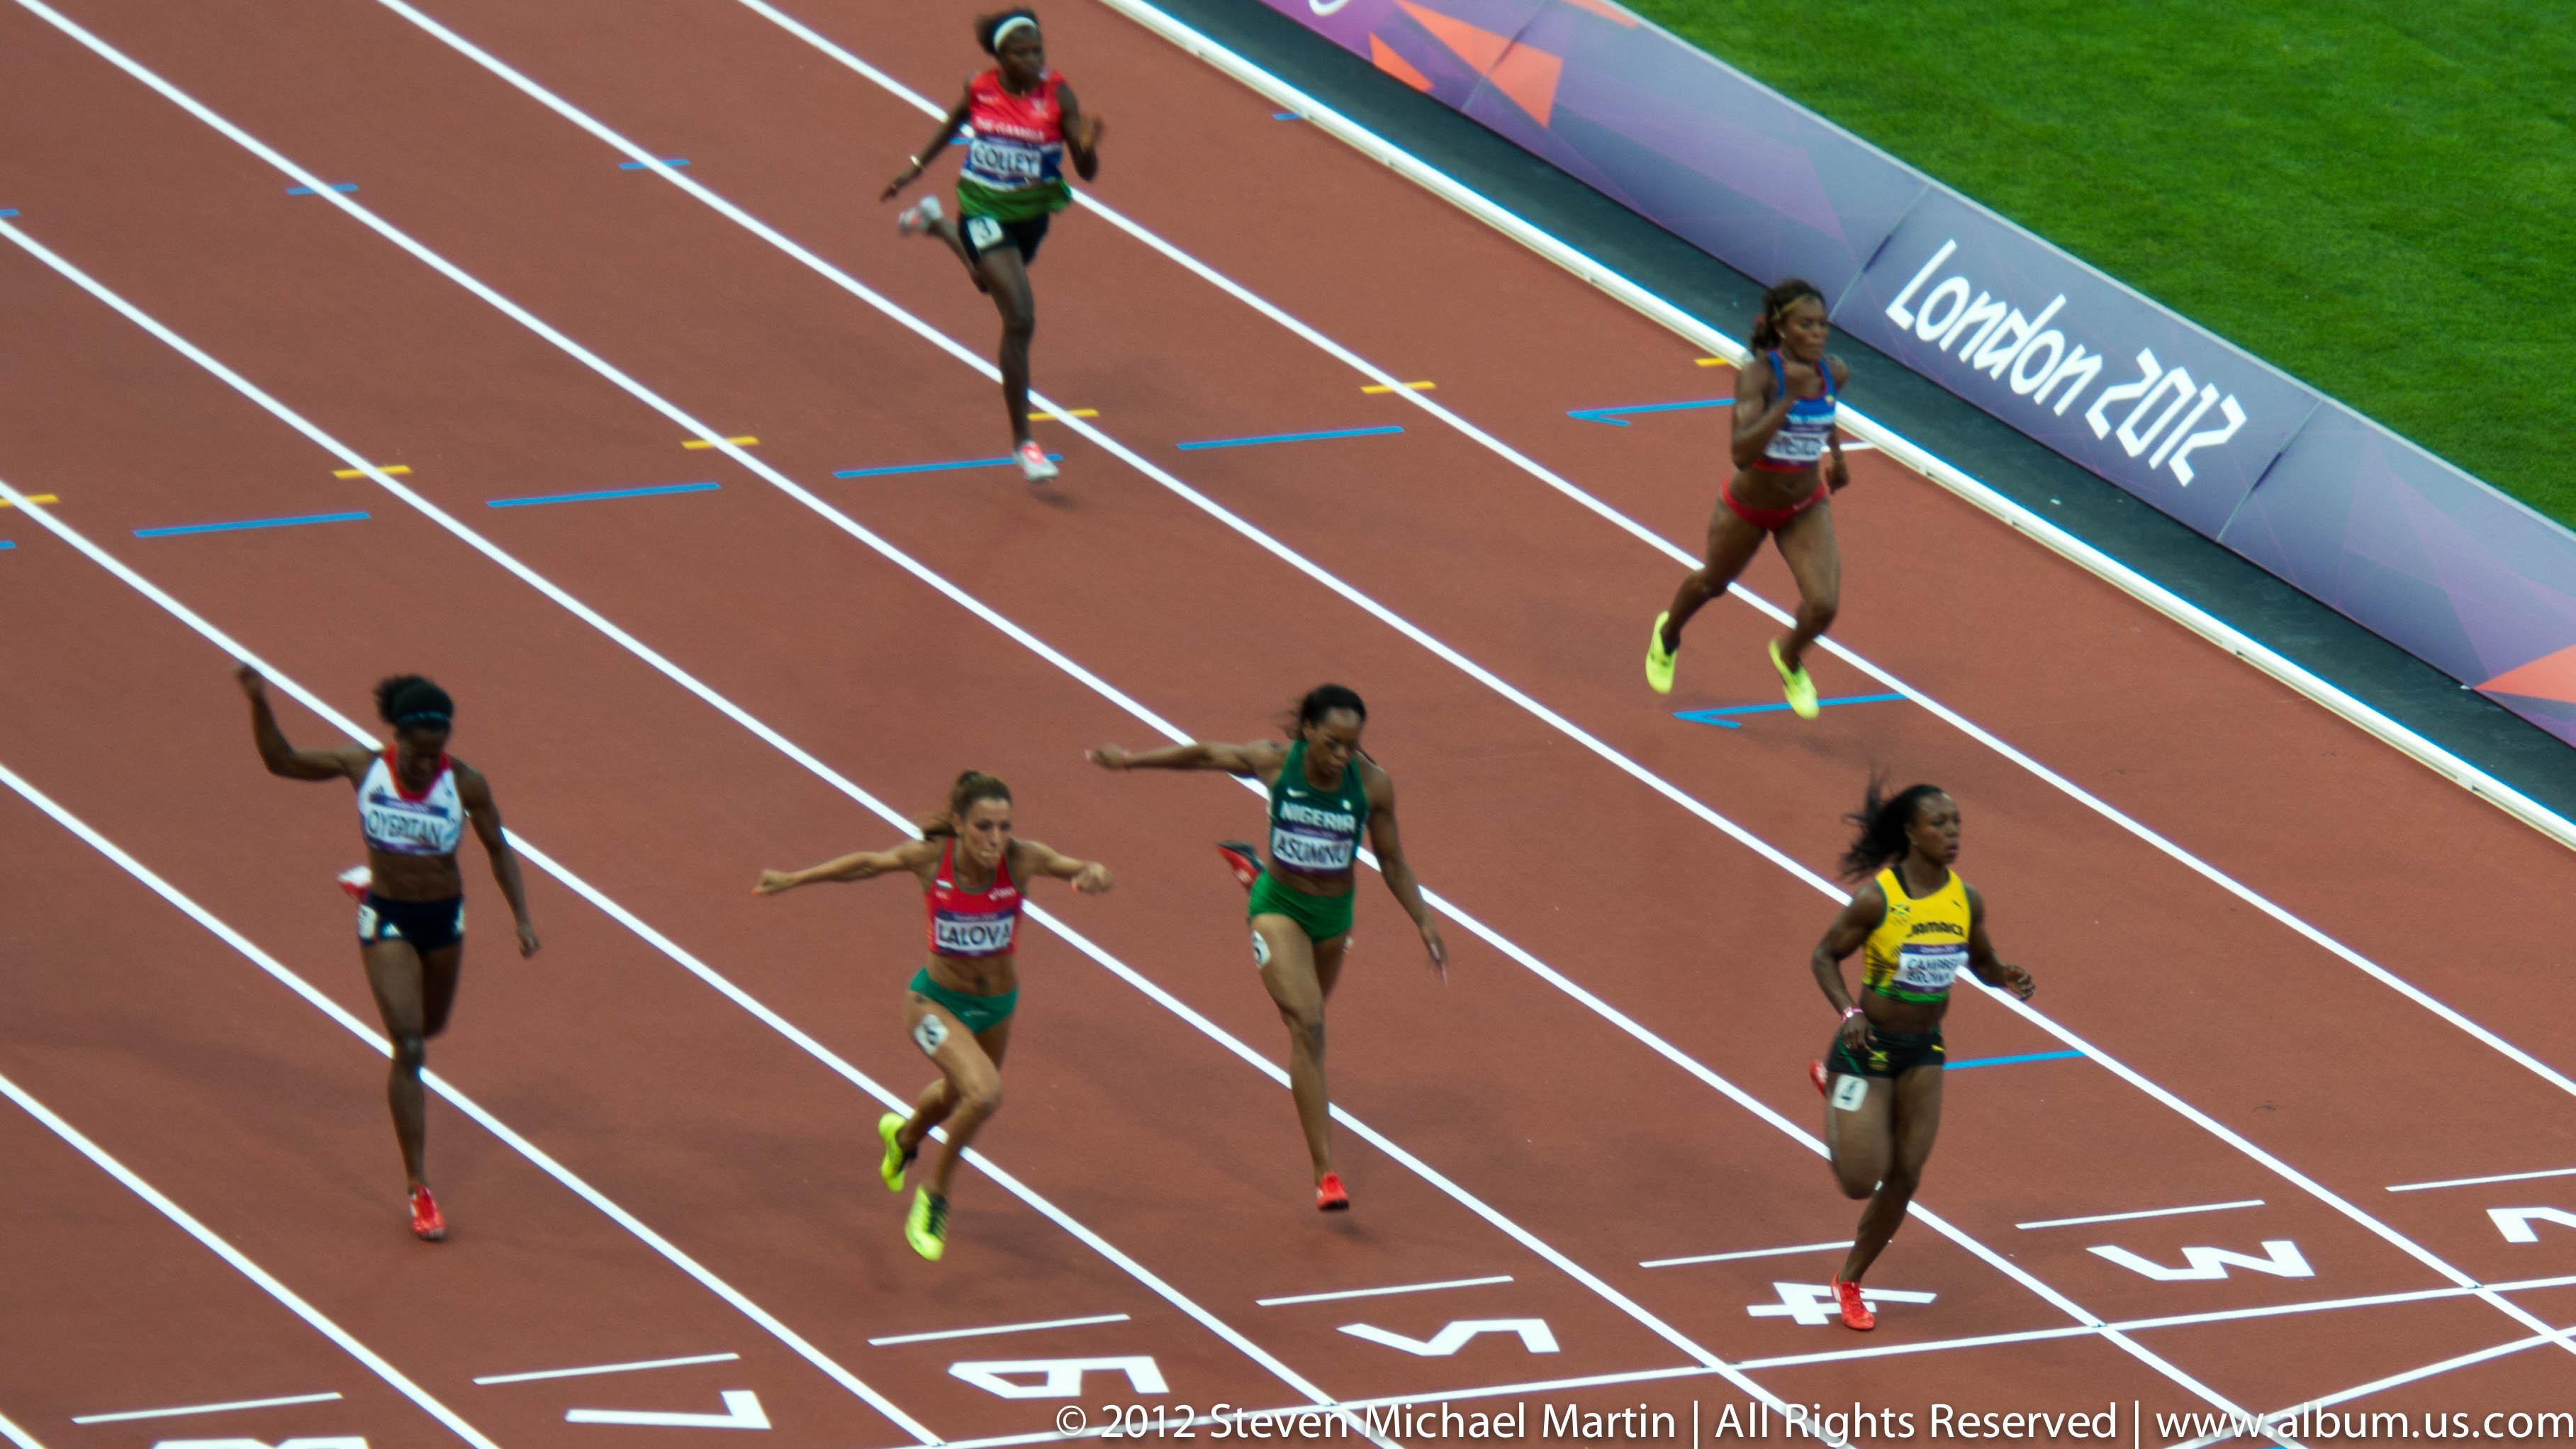 SMartin_2012 Olympics Athletics_20120803_014